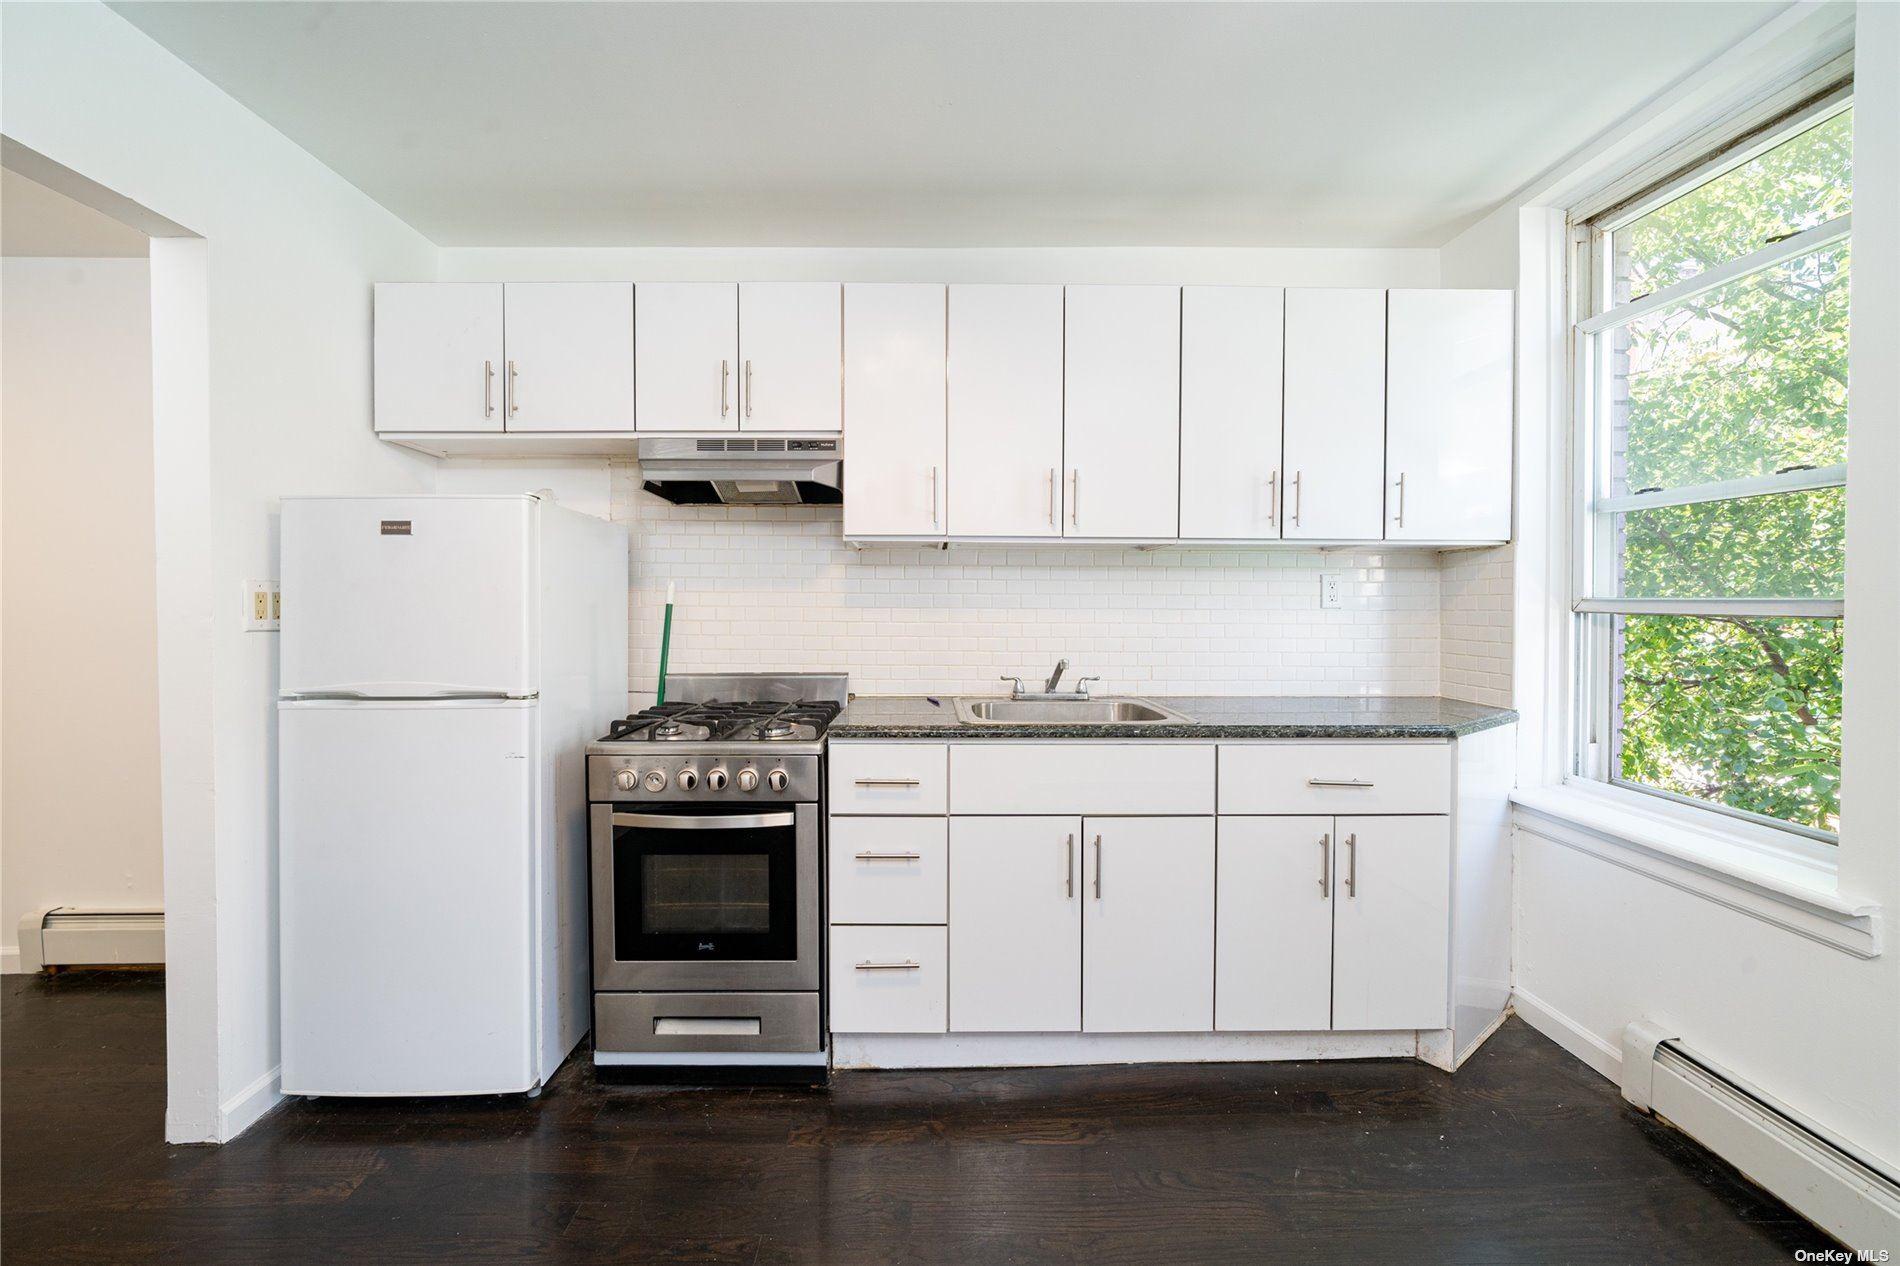 85 Havemeyer Street, Williamsburg, NY 11211 - MLS#: 3322457